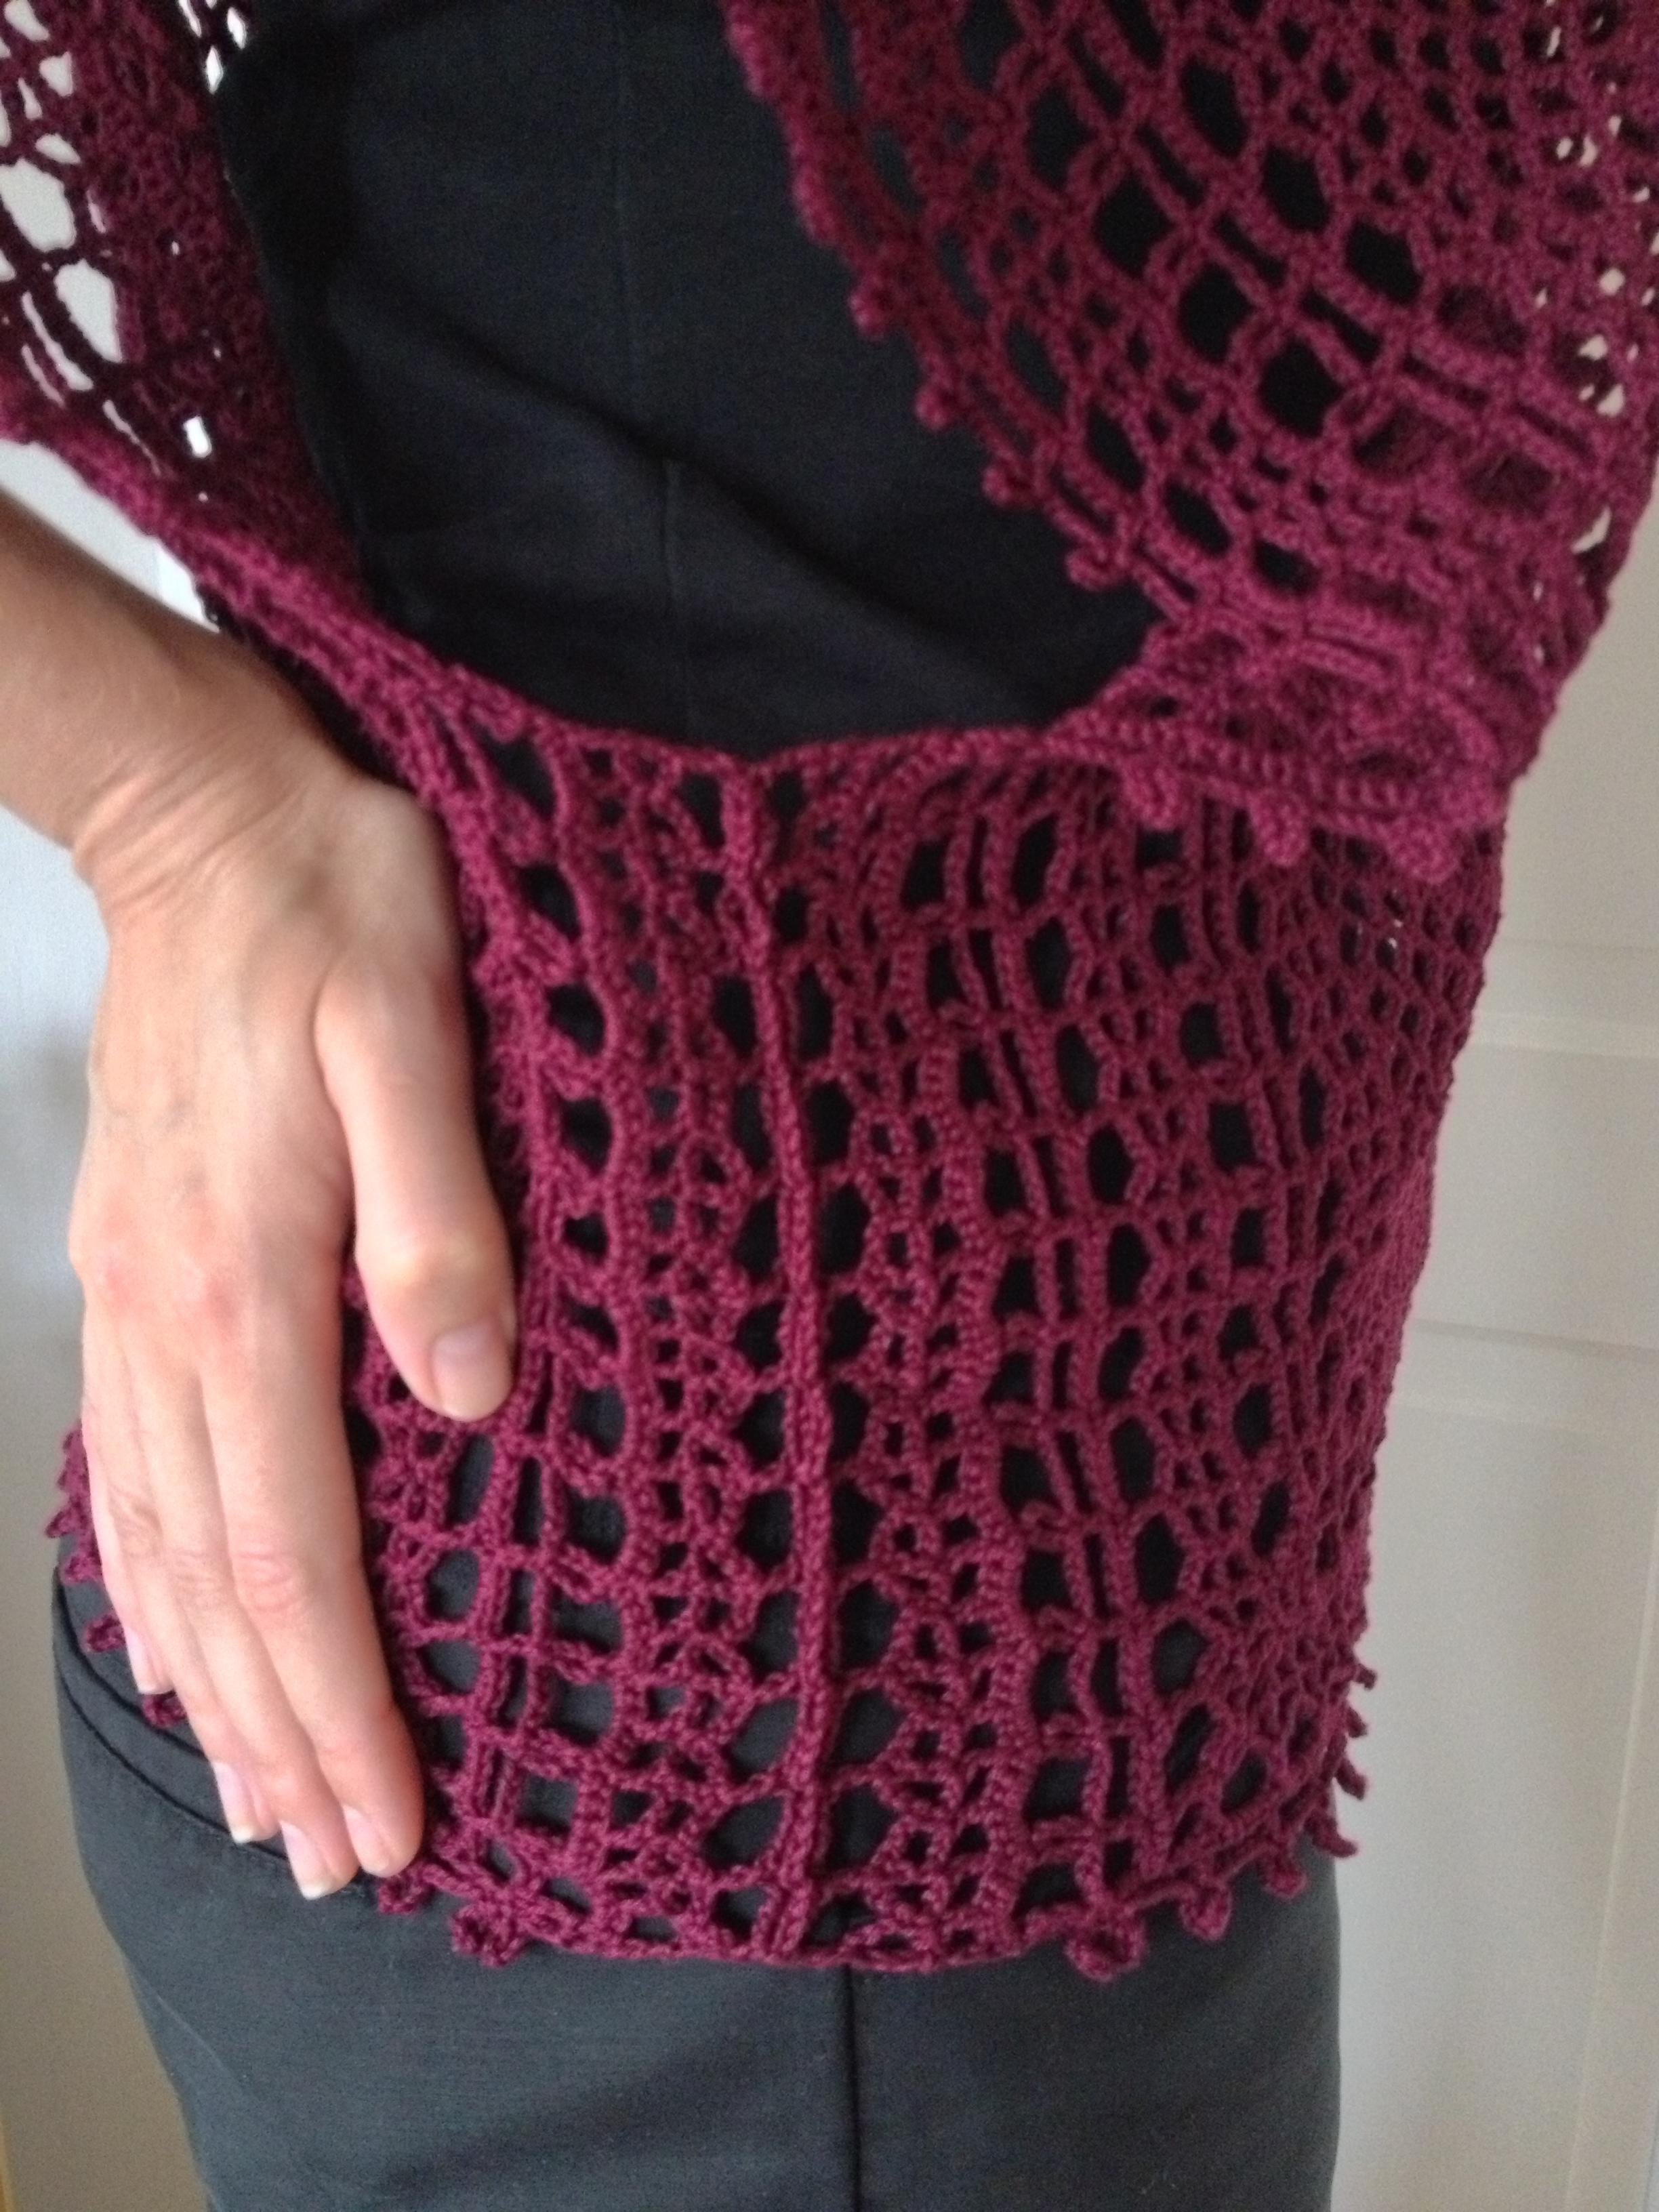 Free Crochet Patterns Japanese Style : Japanese Crochet Patterns images